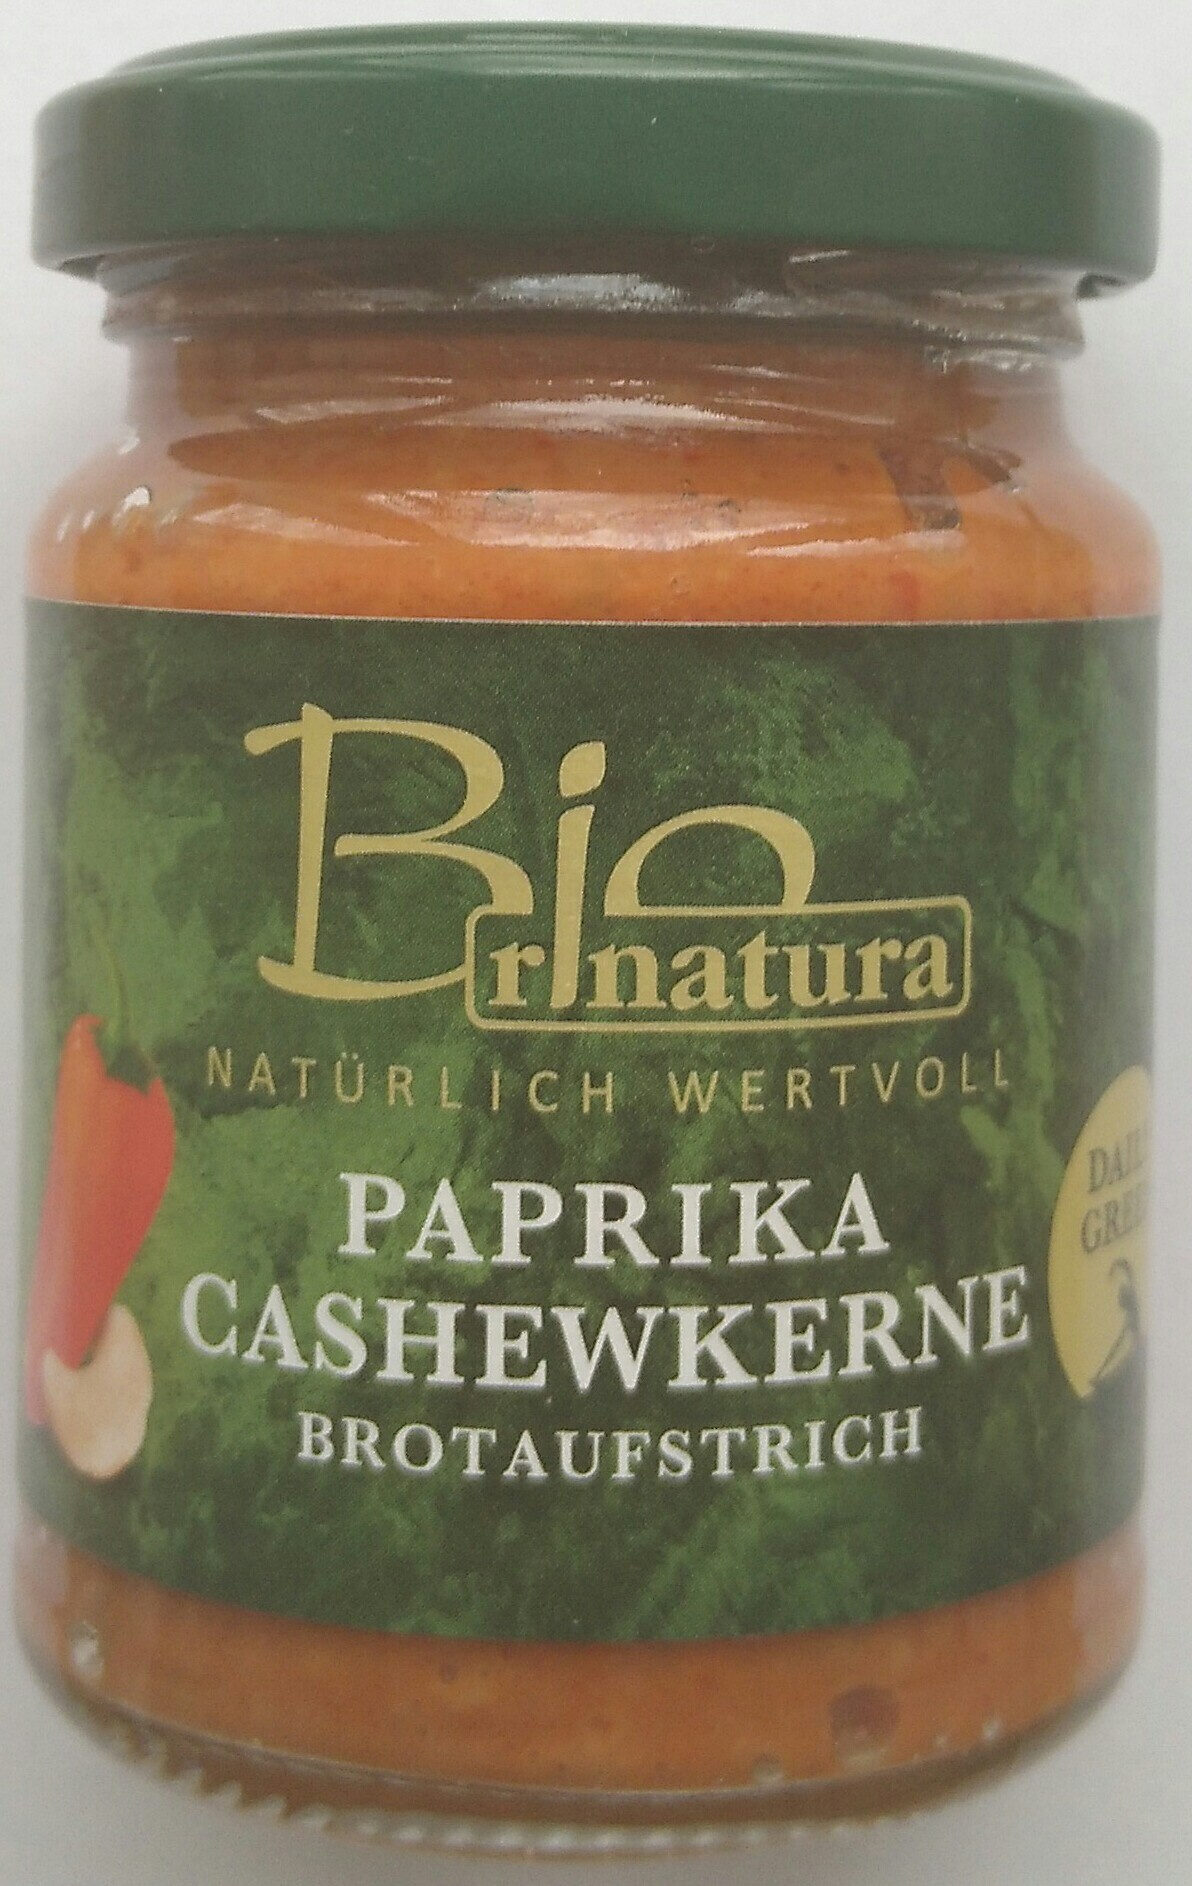 Paprika Cashewkerne Brotaufstrich - Produit - de